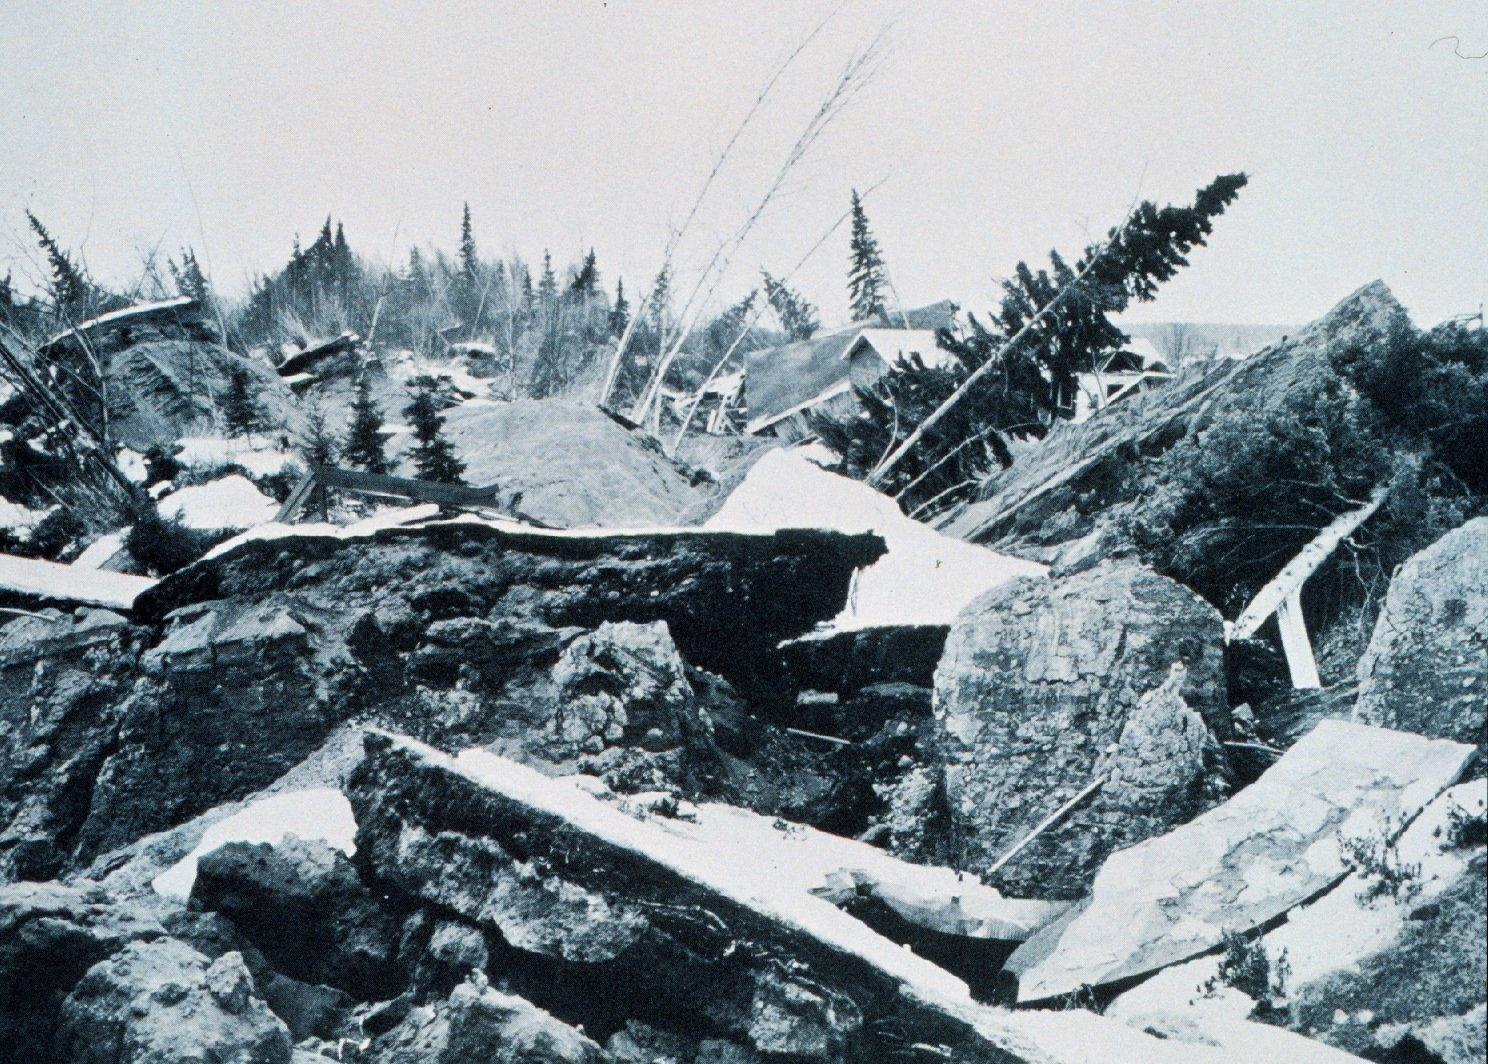 2 Prince William, Alaska Ten Most Deadliest and Destructive Earthquakes Since 1900